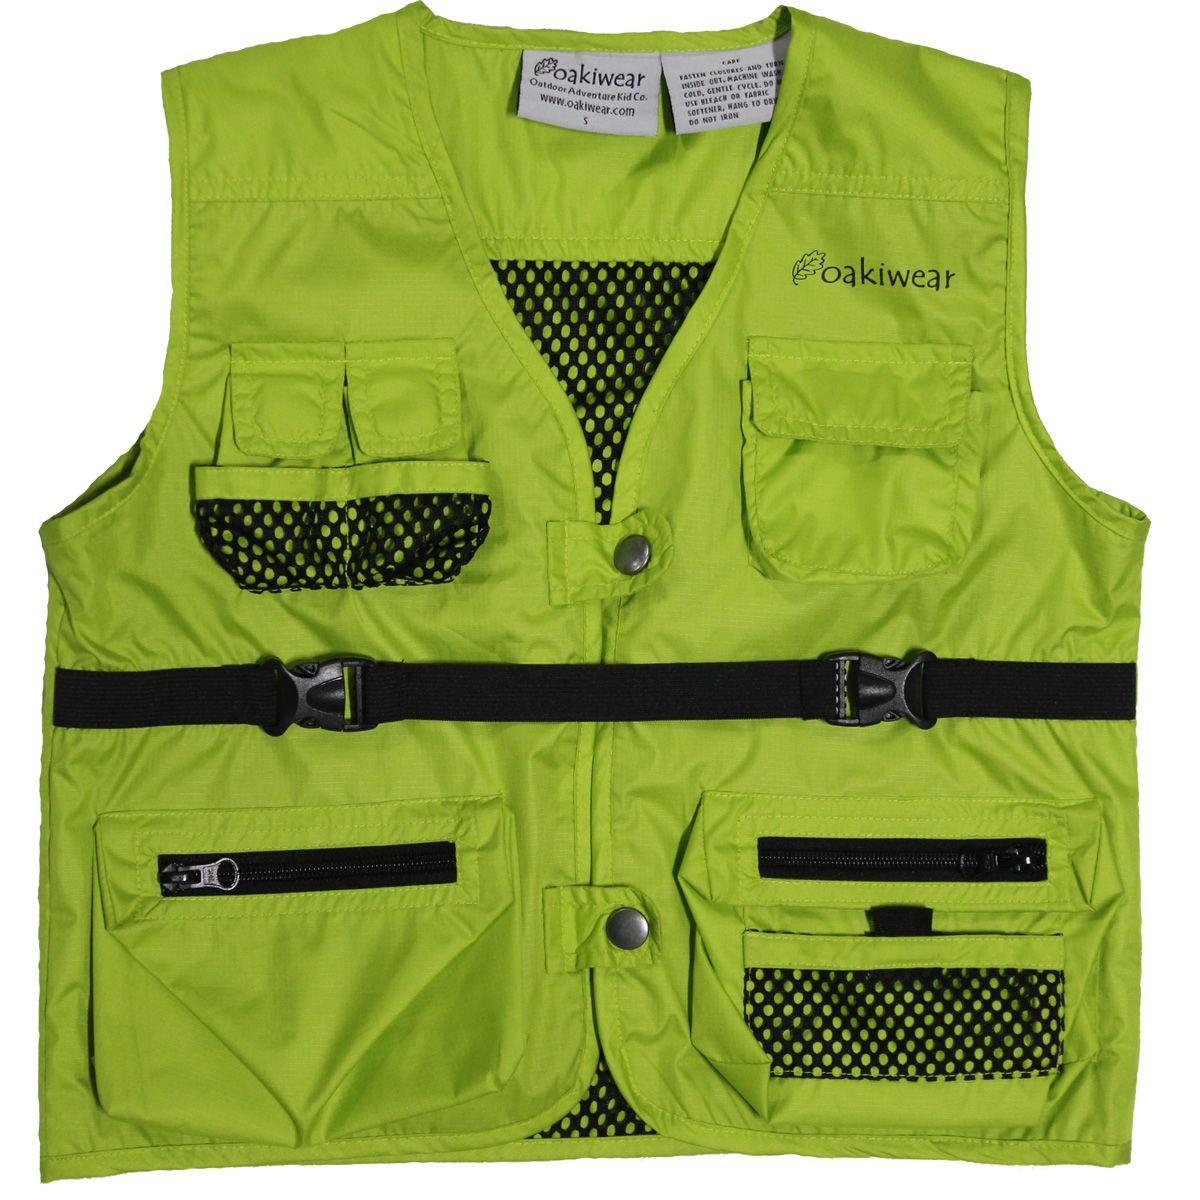 d09e30bc1 Oakiwear Ultimate Explorer Vest for kids. Explorer Vests enable any ...